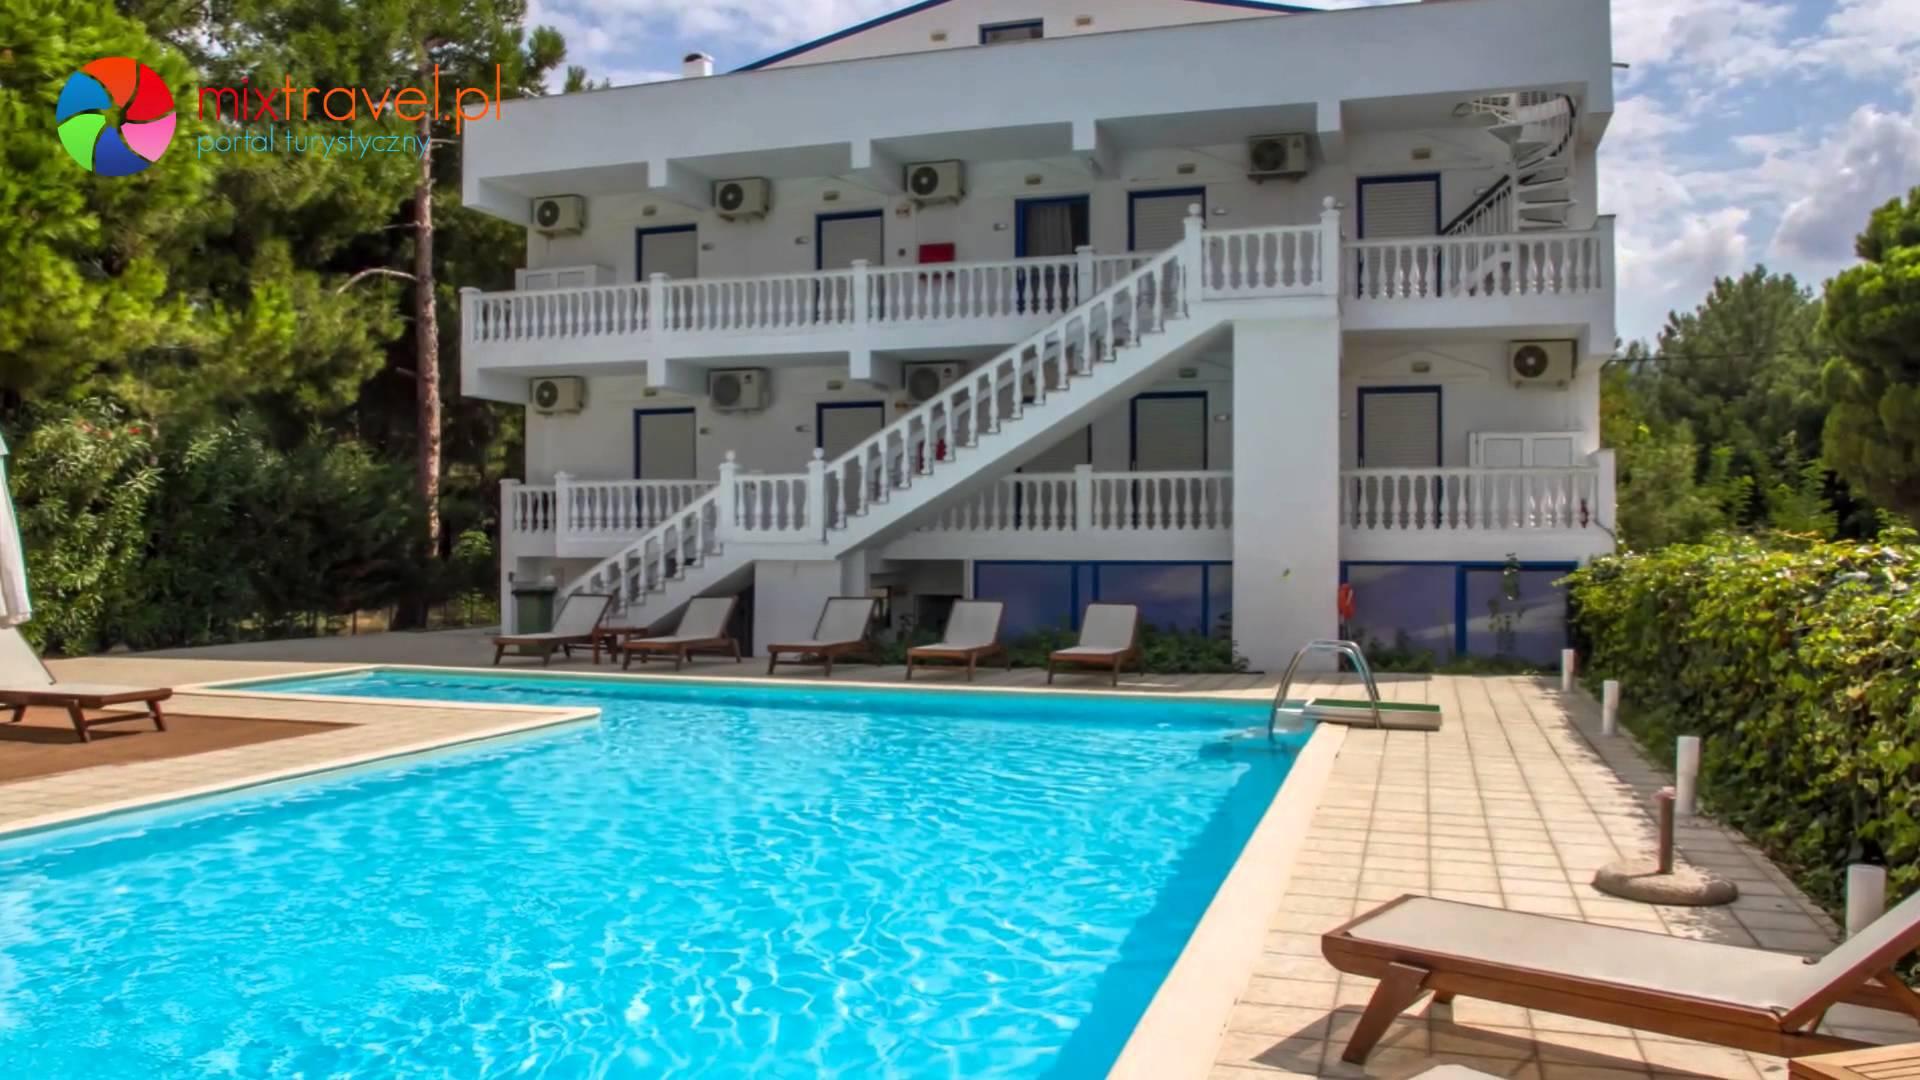 Kazaviti Hotel & Apartments - Skala Prinos, Thassos